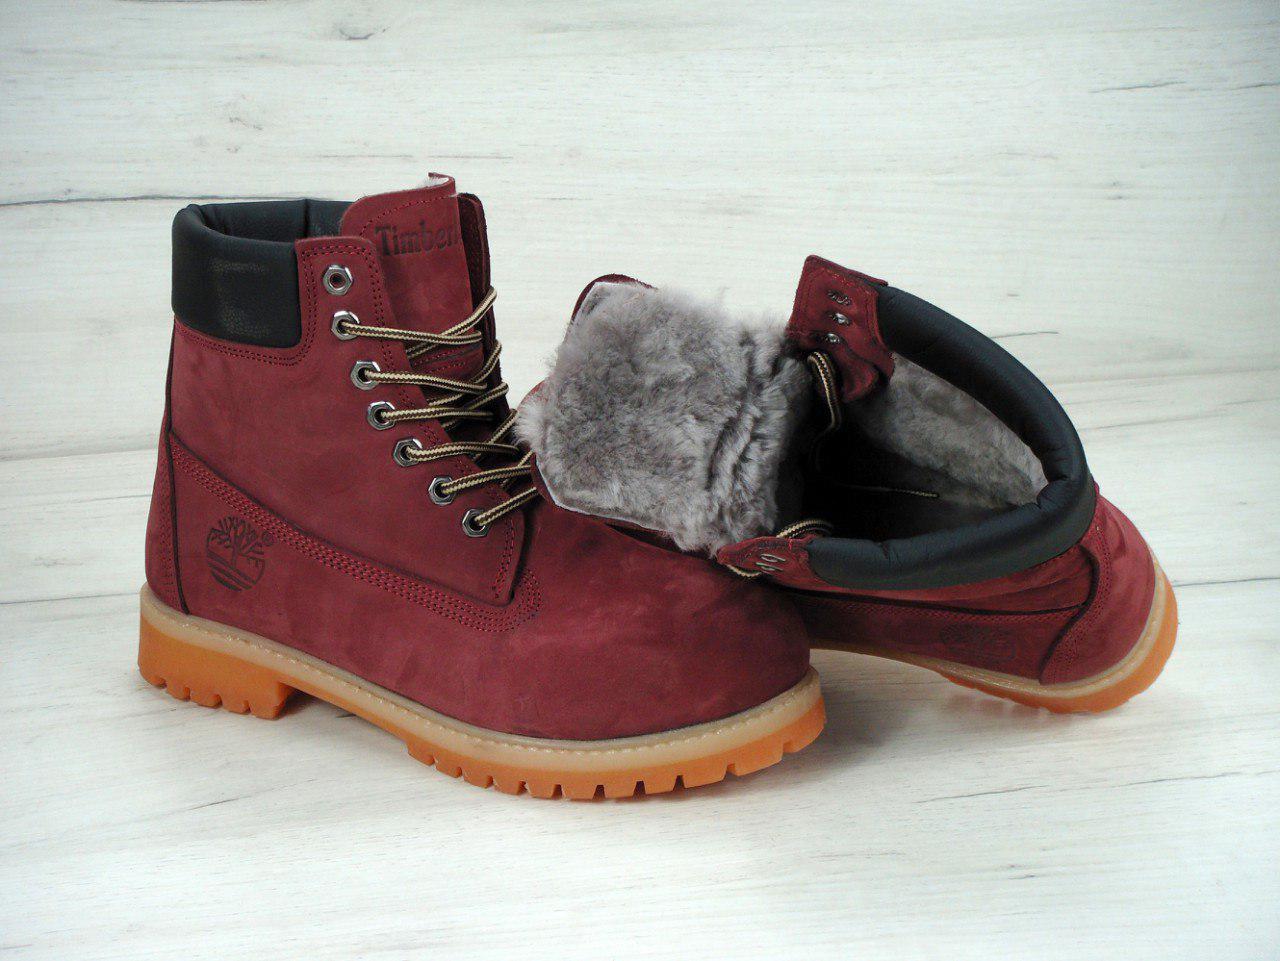 7464fa18e6d0 Ботинки зимние женские в стиле Timberland код товара KD-11077. Бордовые -  SNKRS ONE